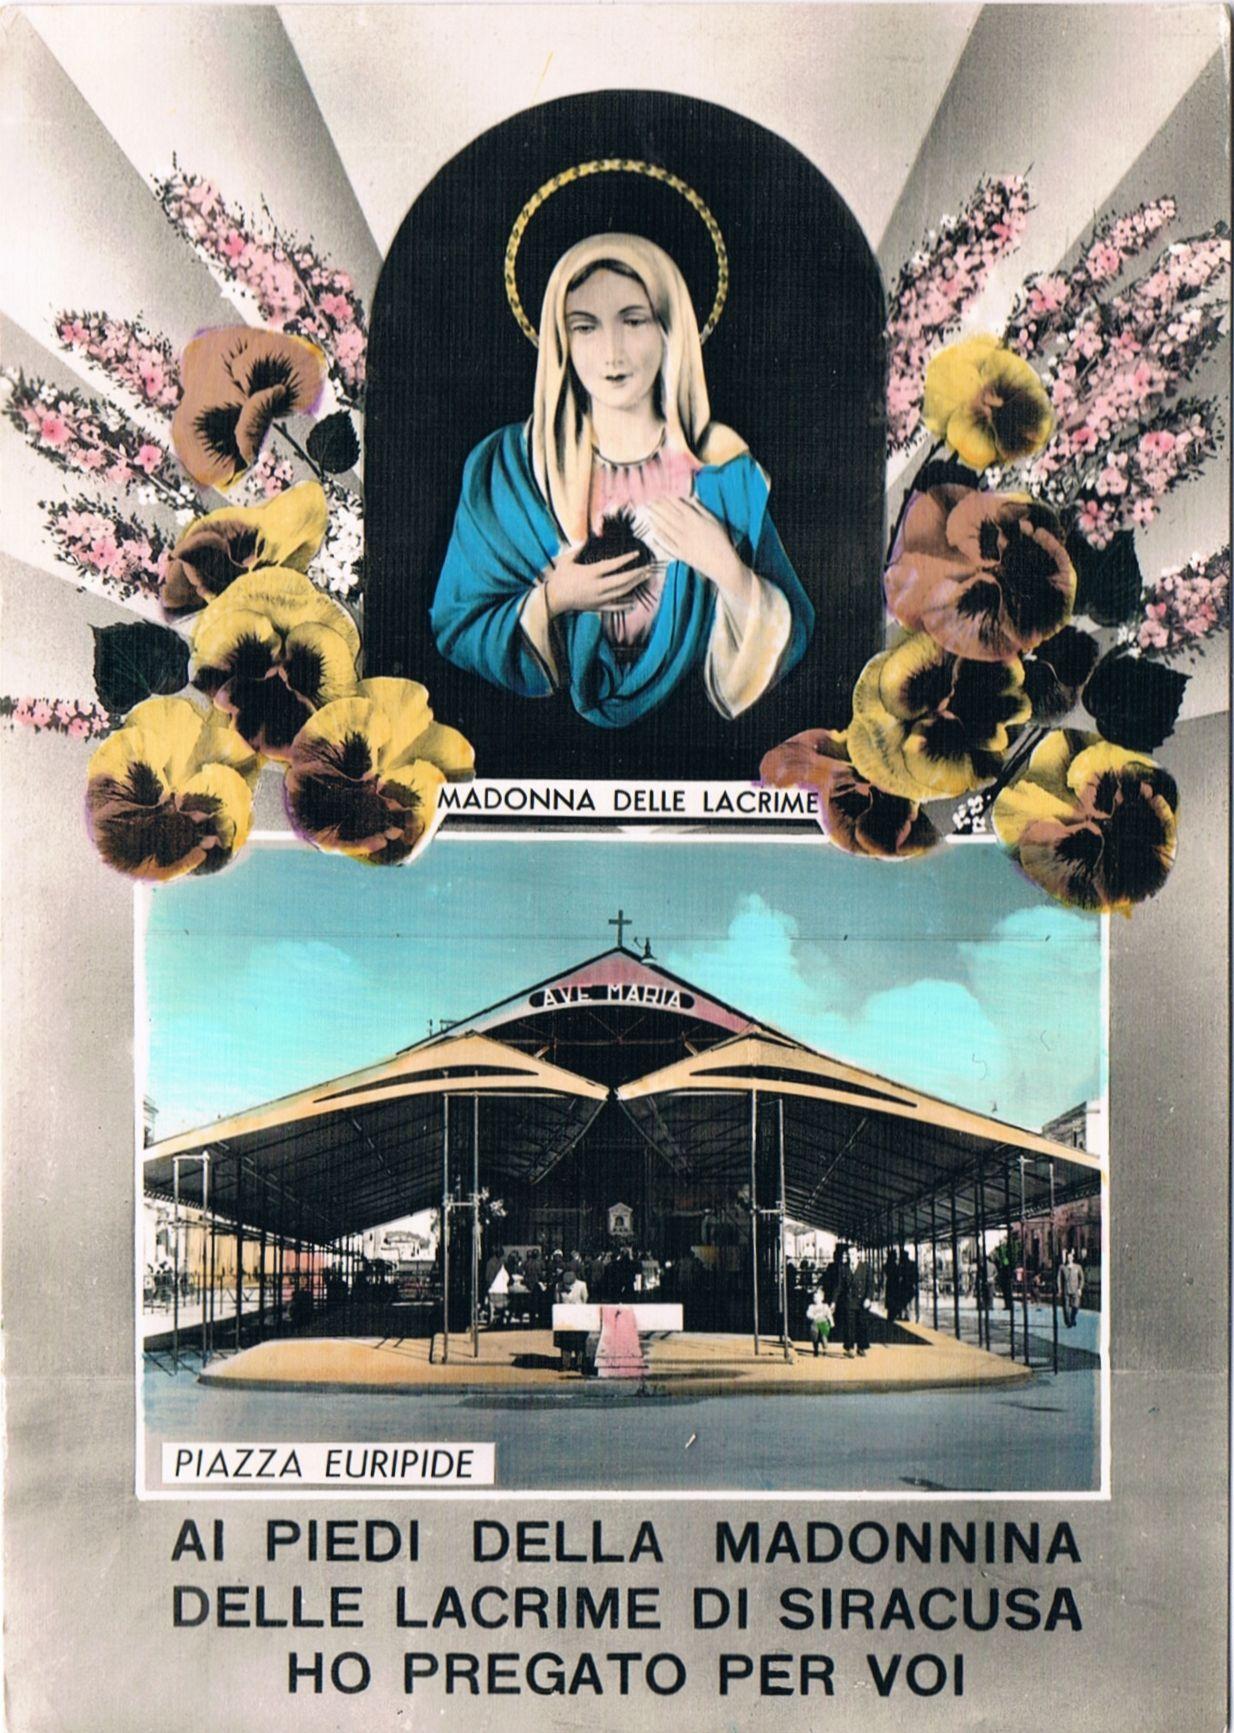 SIRACUSA - Madonnina delle lacrime - 1958